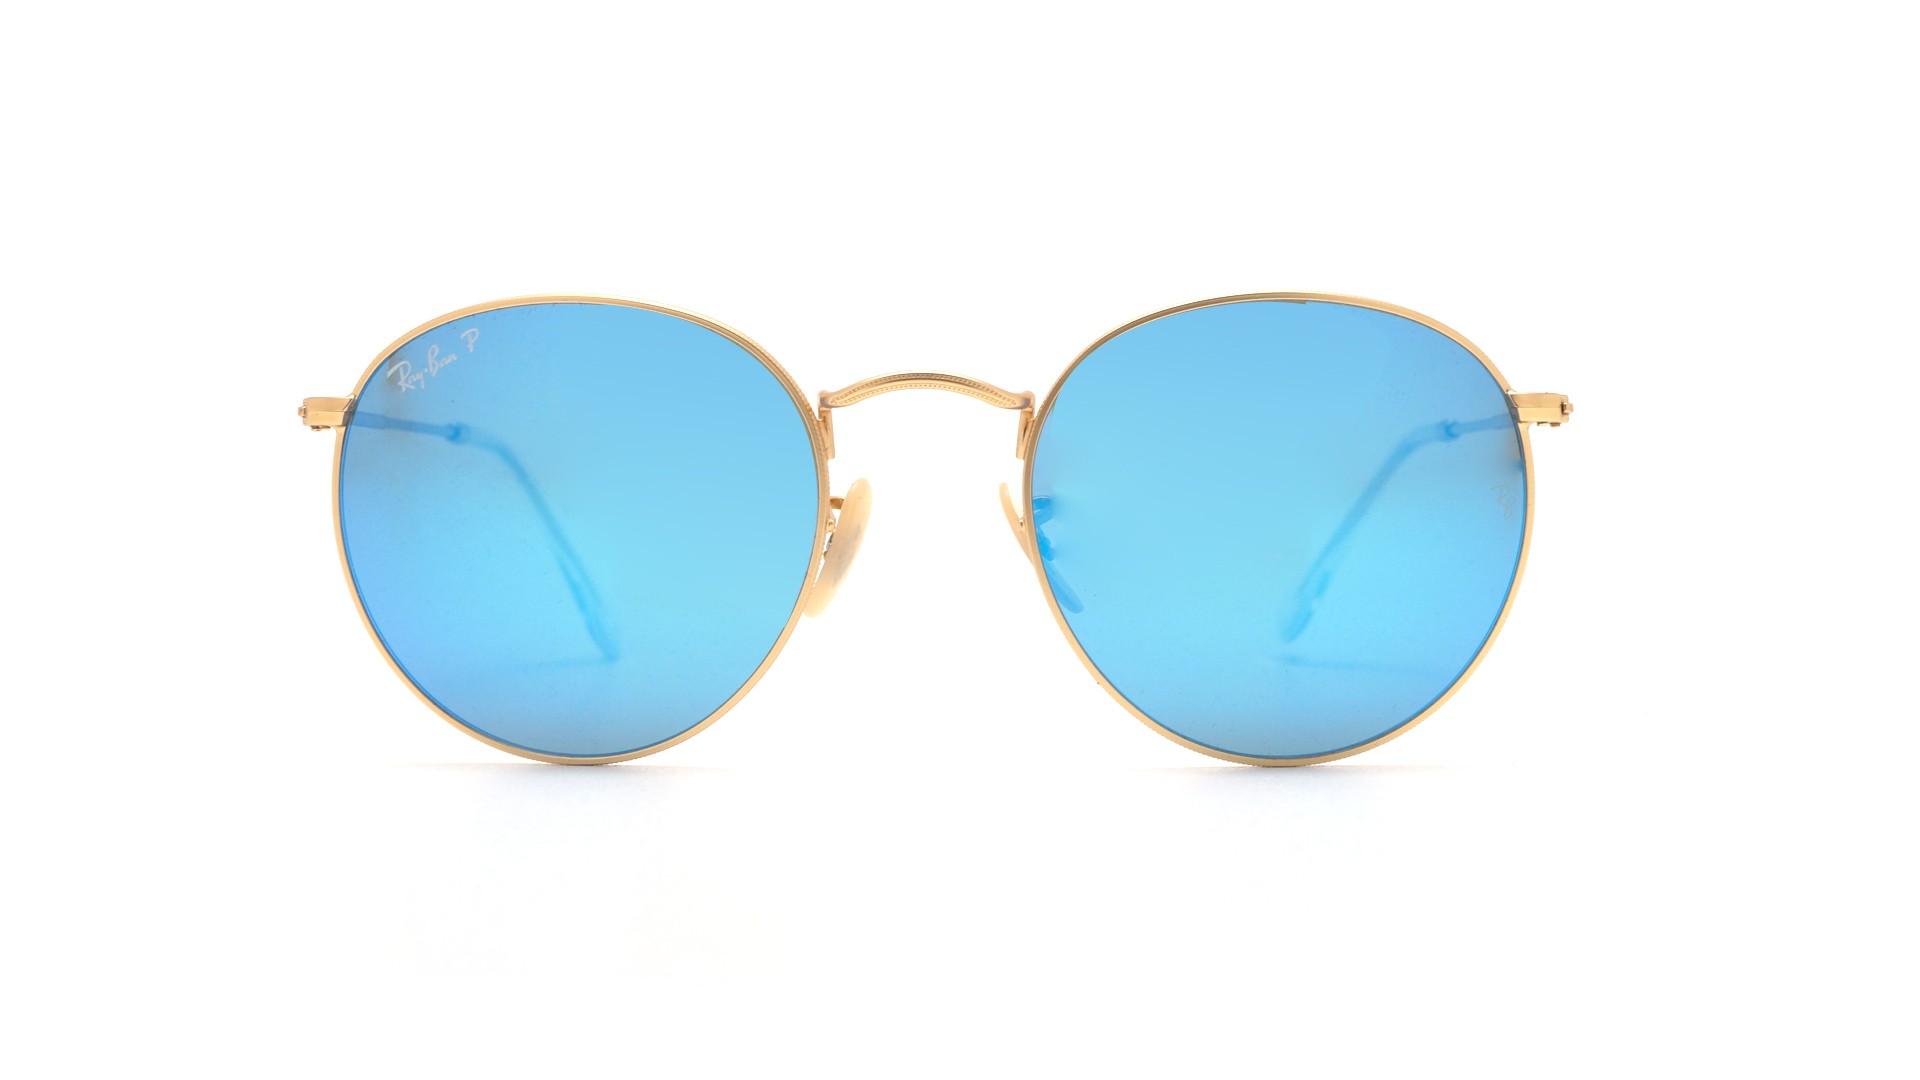 df9b081750 Sunglasses Ray-Ban Round Metal Gold Flash Lenses RB3447 112/4L 50-21 Medium  Polarized Mirror